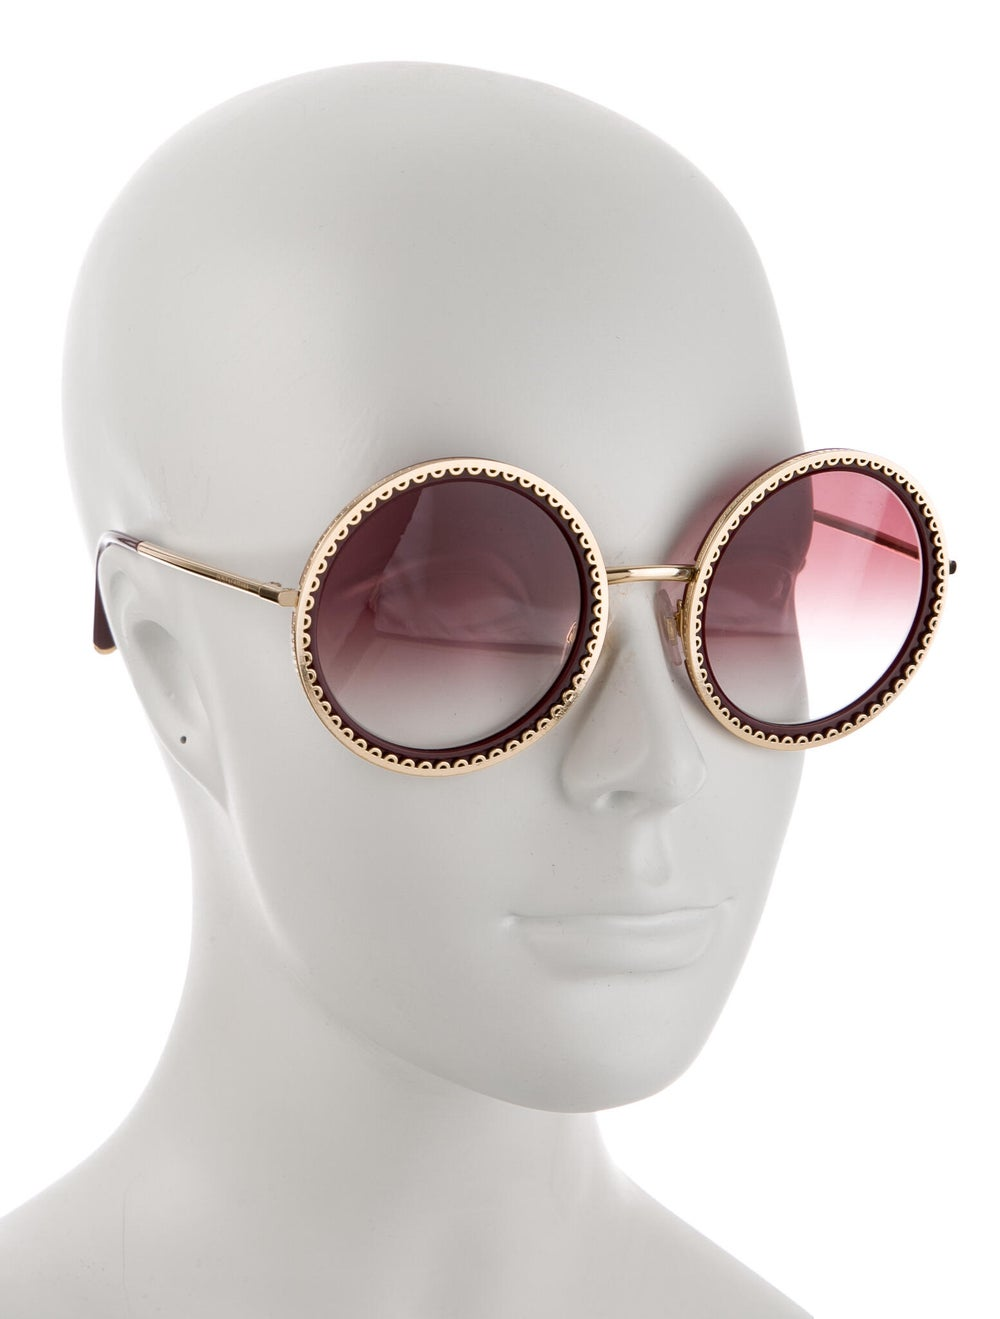 Dolce & Gabbana Round Gradient Sunglasses - image 4